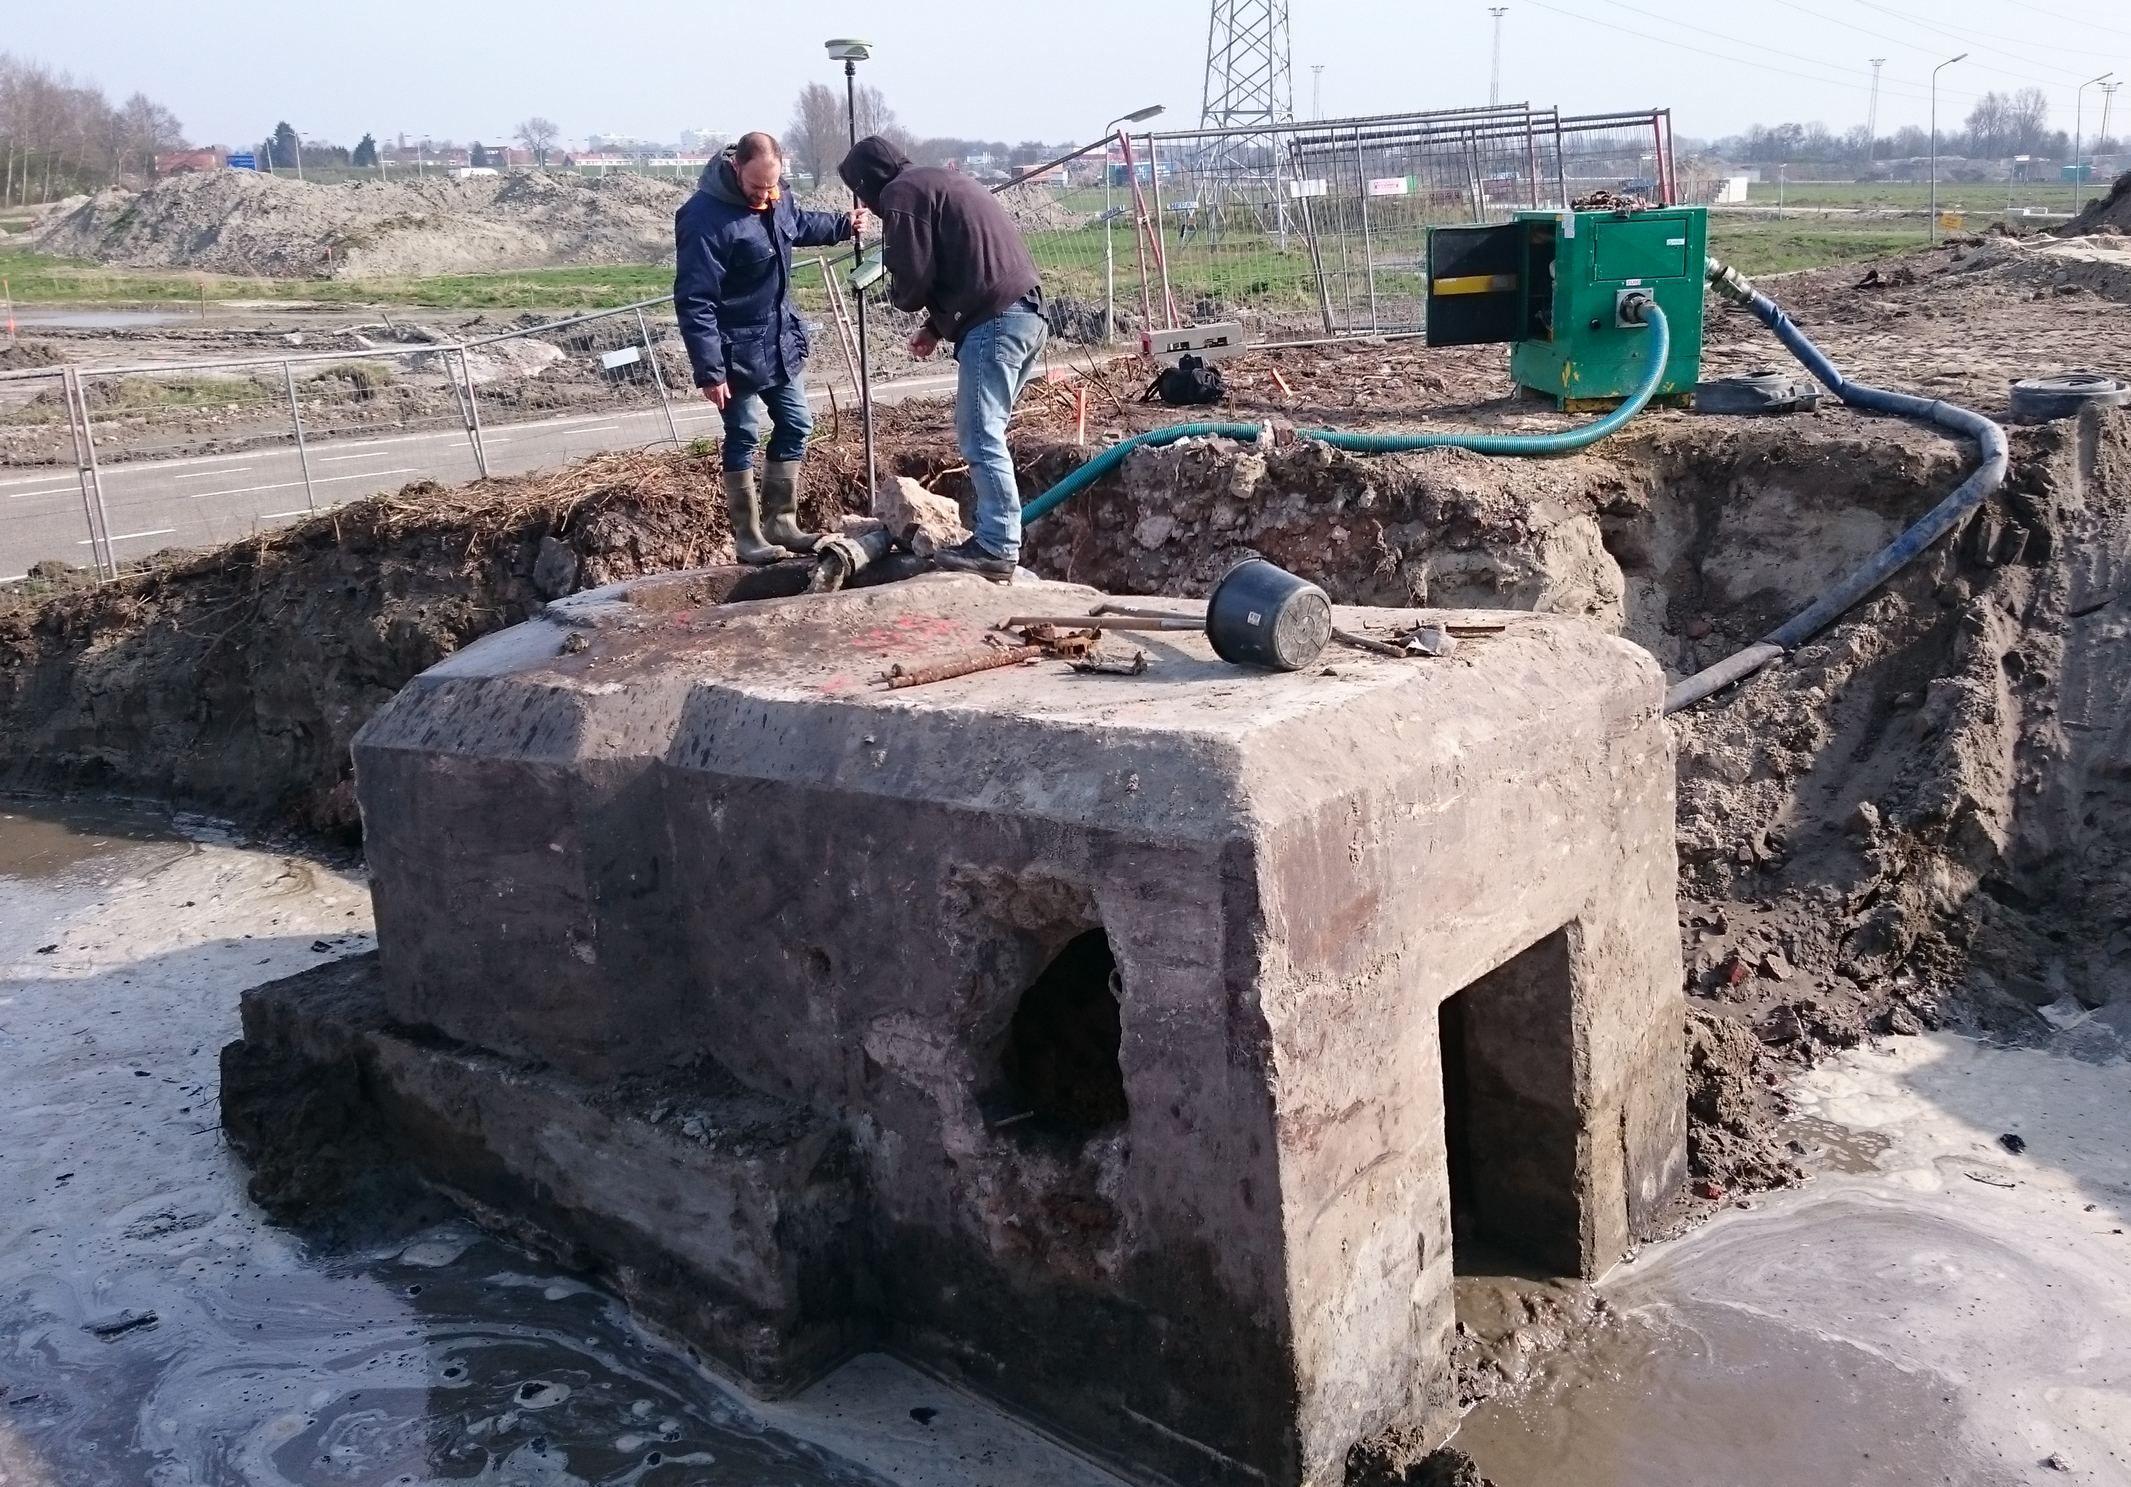 Het Vlissingse tobruk-bunkertje (foto Walcherse Archeologische Dienst).